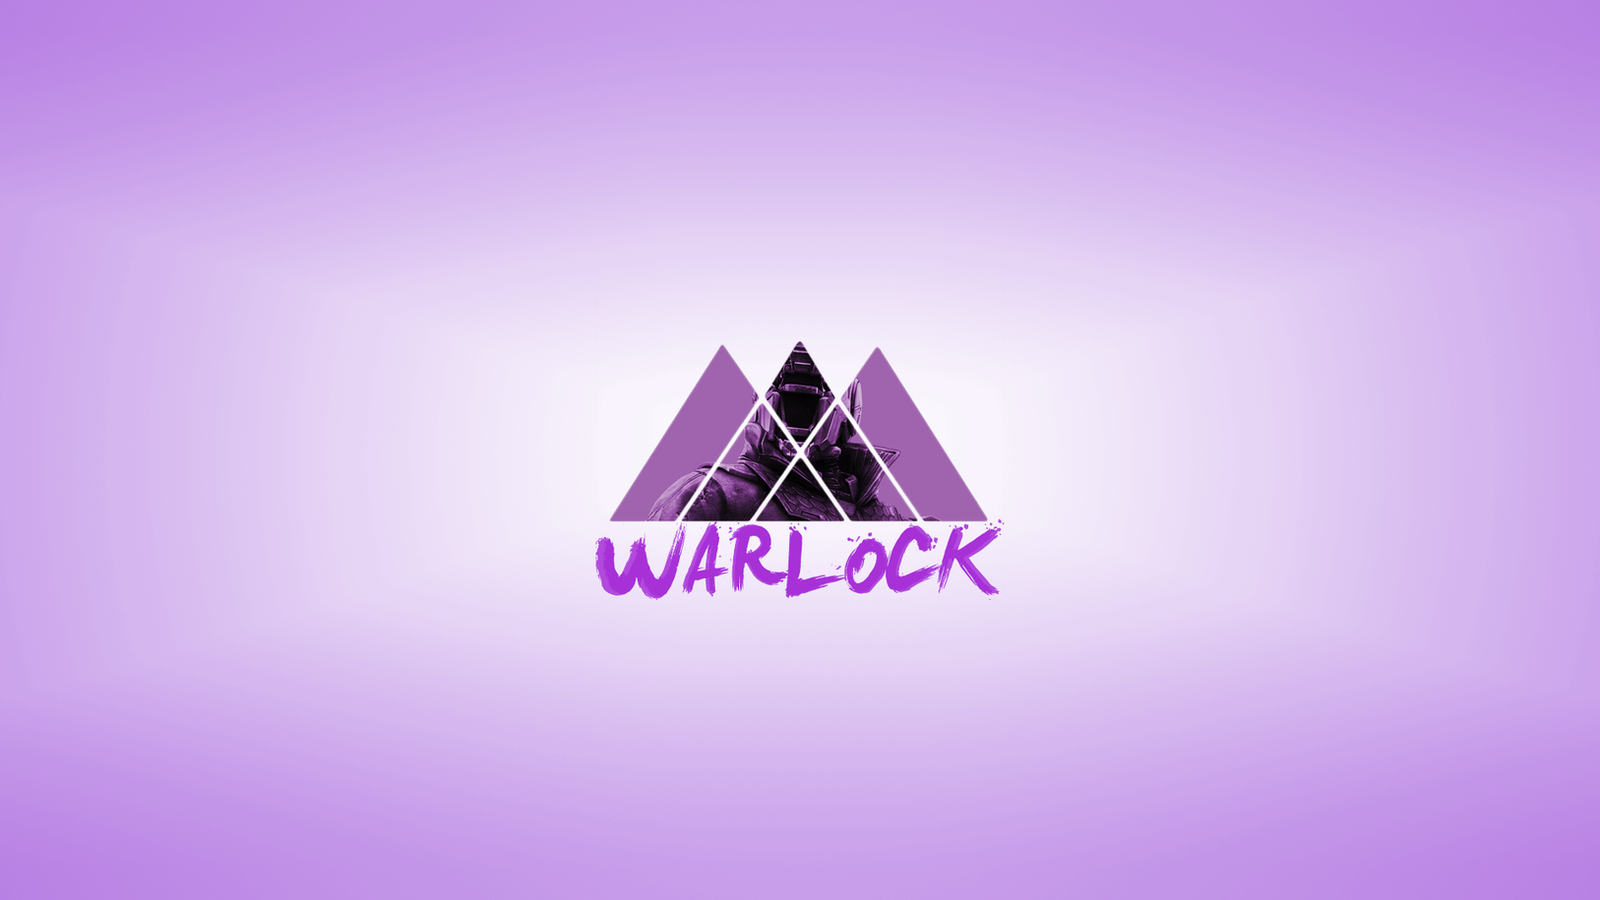 destinywarlockwallpaper by littledesignz on deviantart